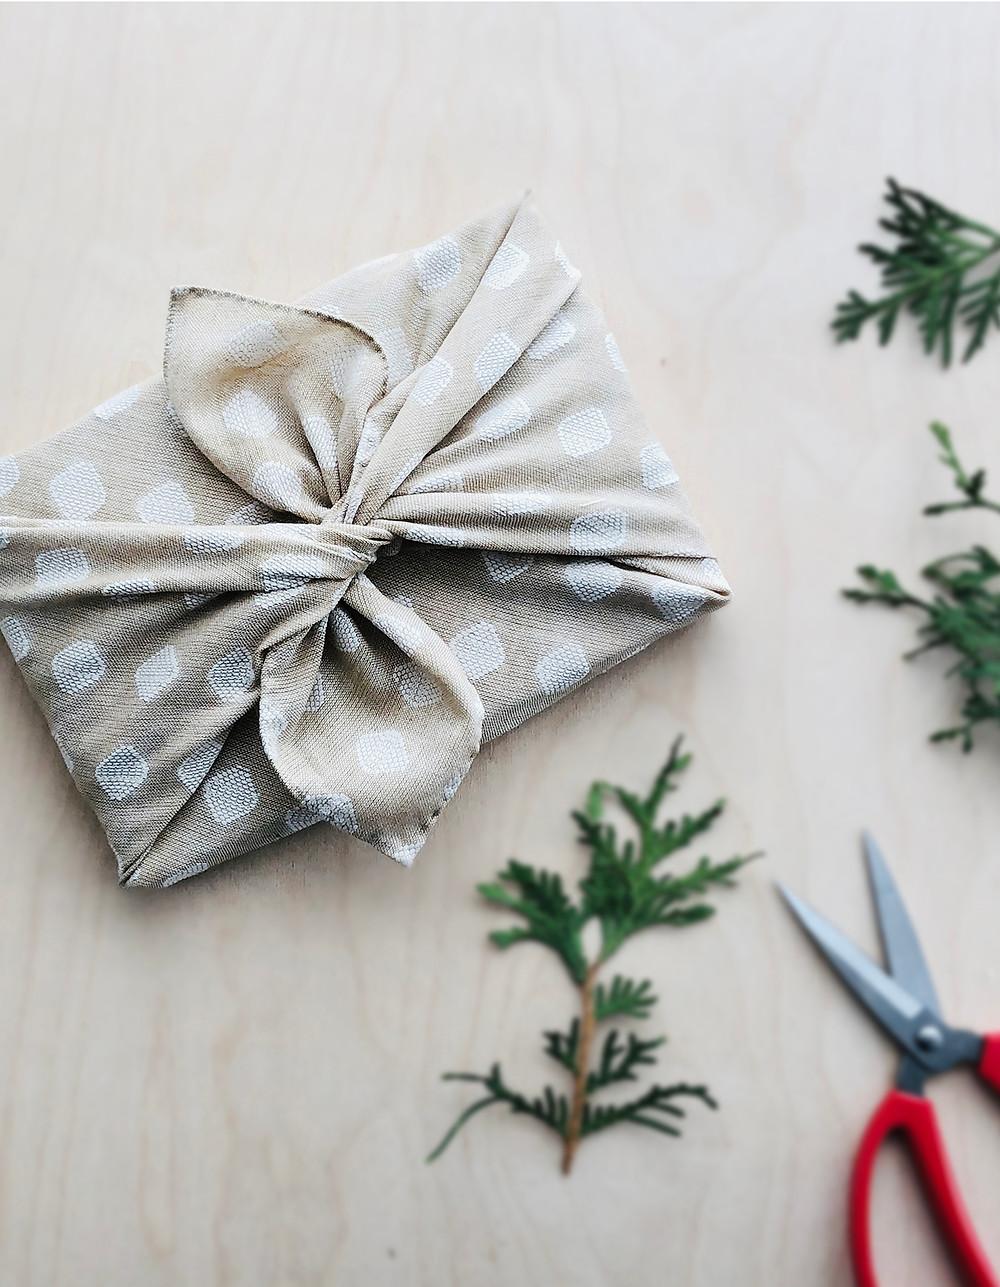 fabric gift wrap - indigobird